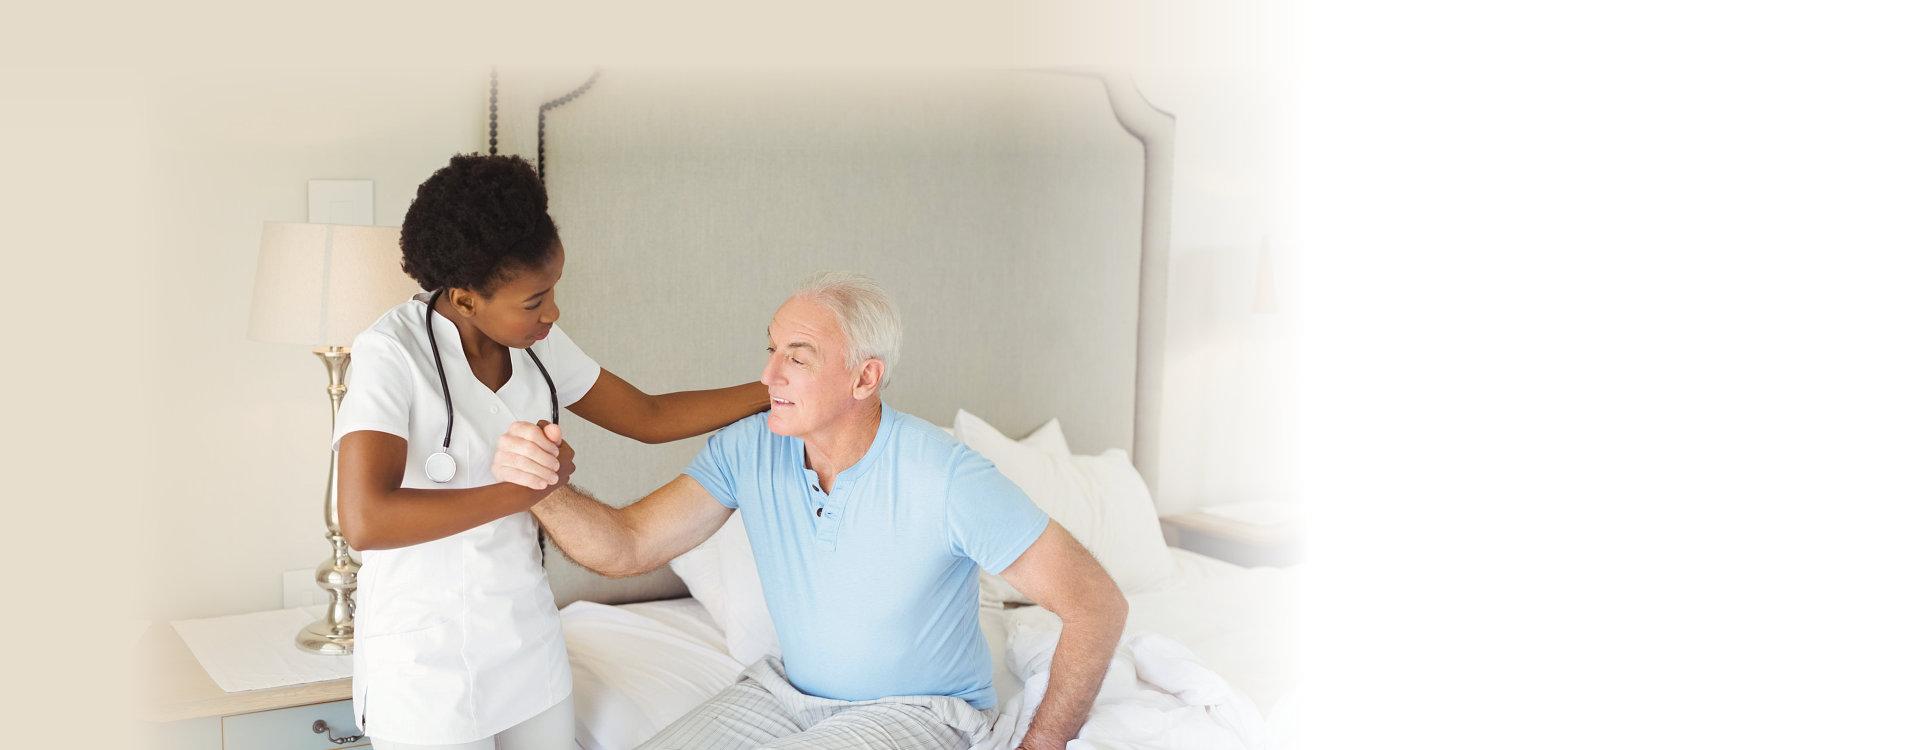 Nurse examining a senior man